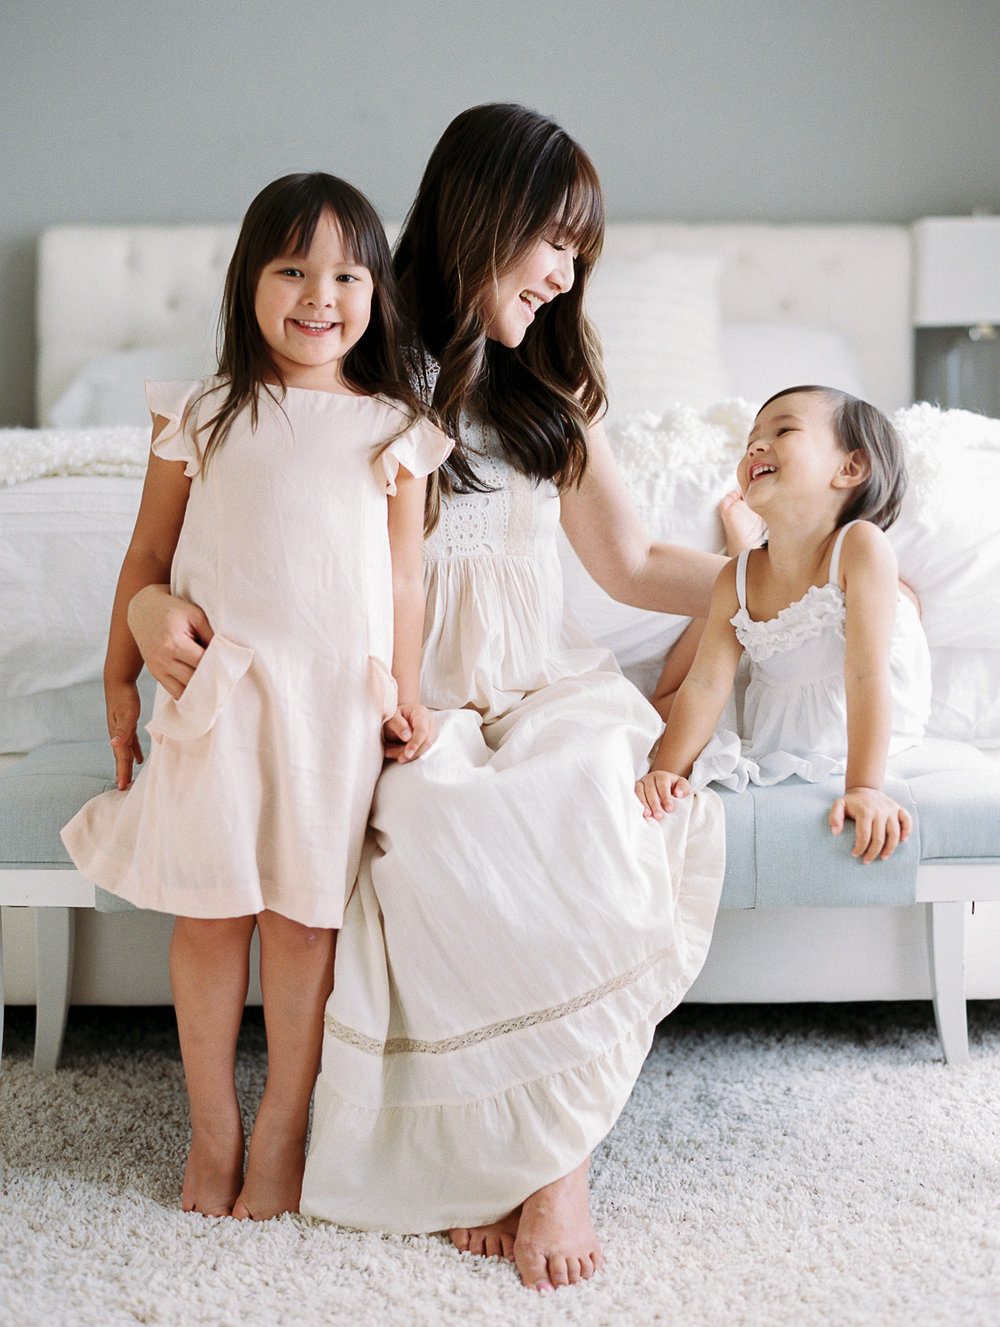 familiesweb0008.jpg